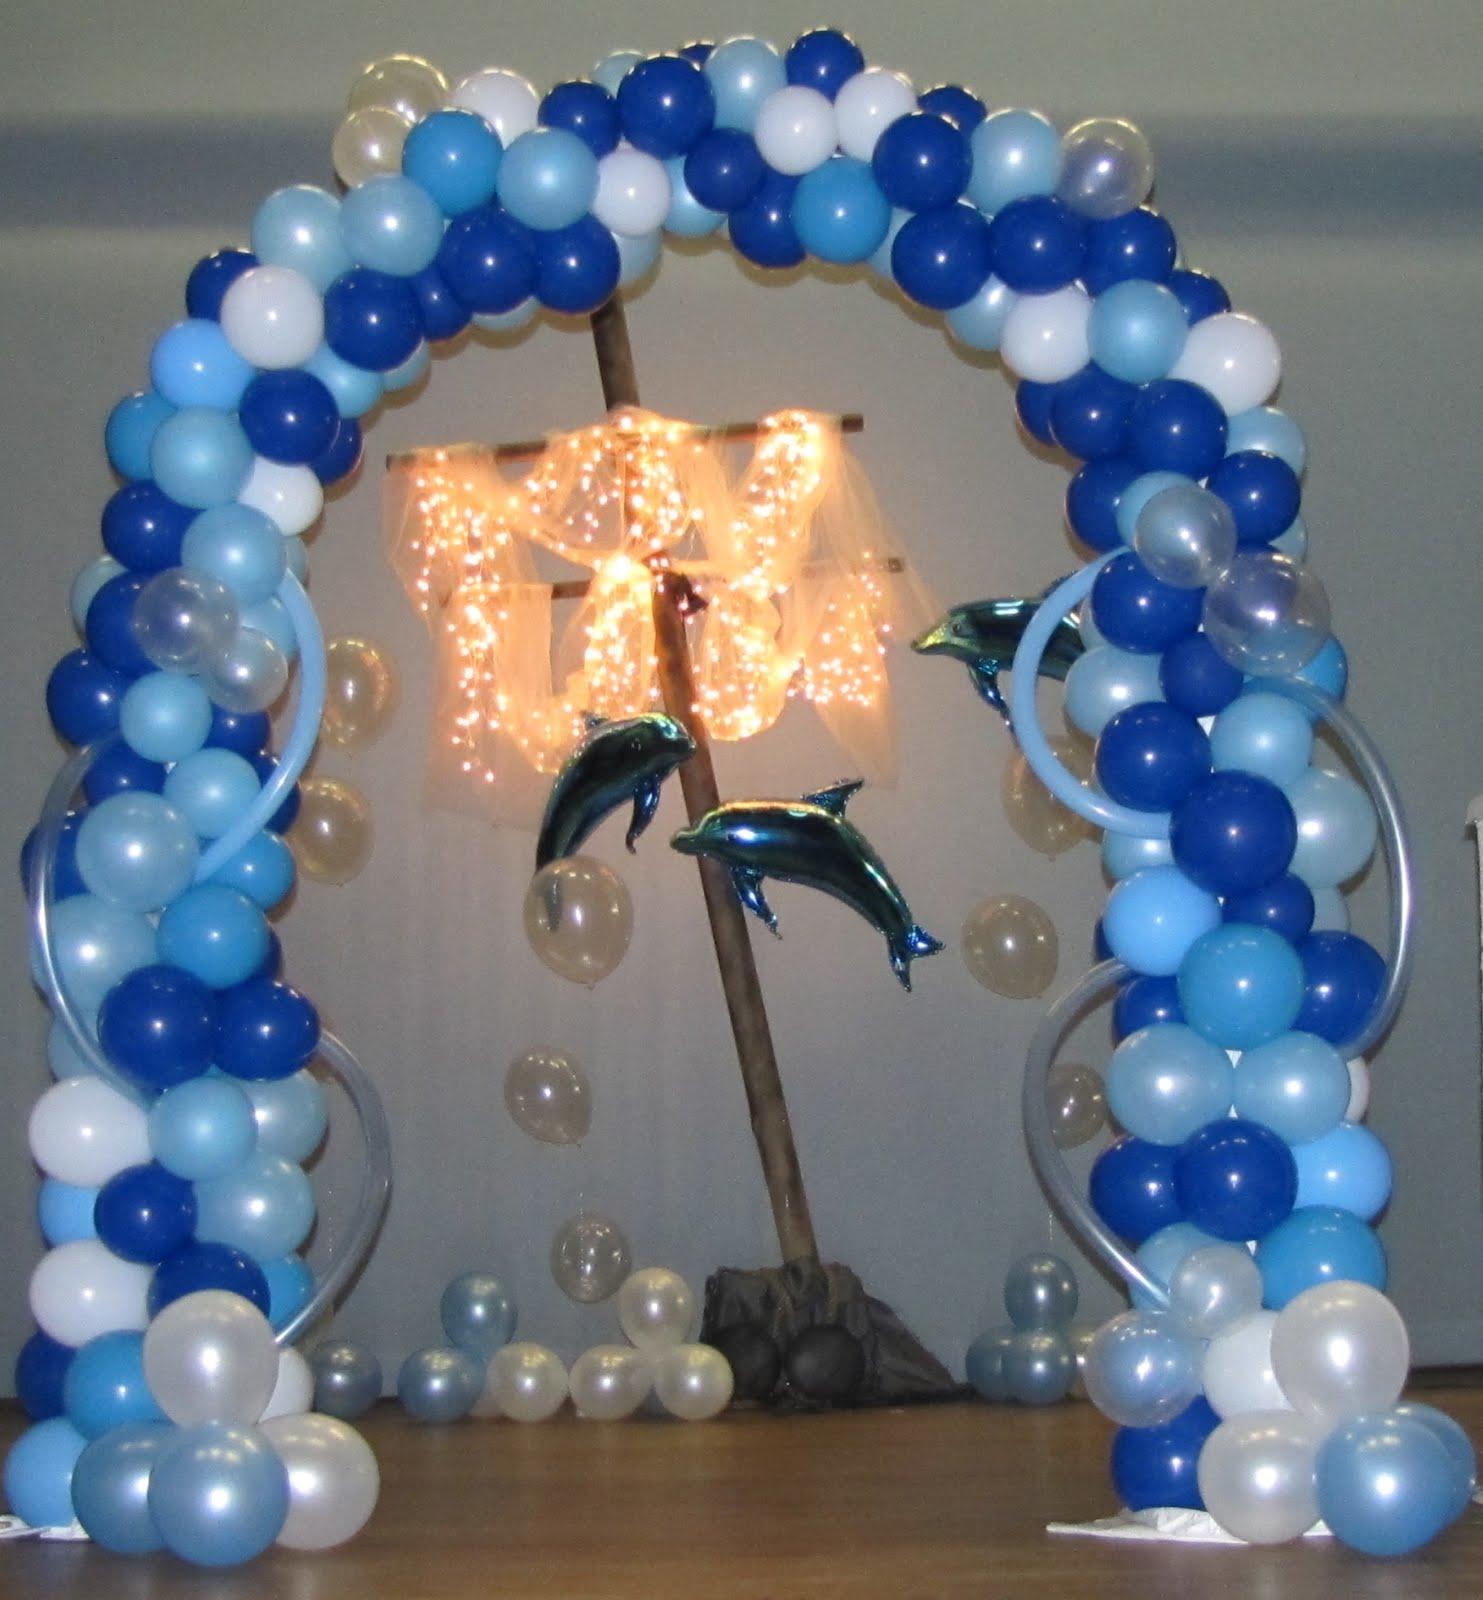 Sports Themed Balloon Decor Under The Sea Quinceanera Under The Sea Tropical Balloon